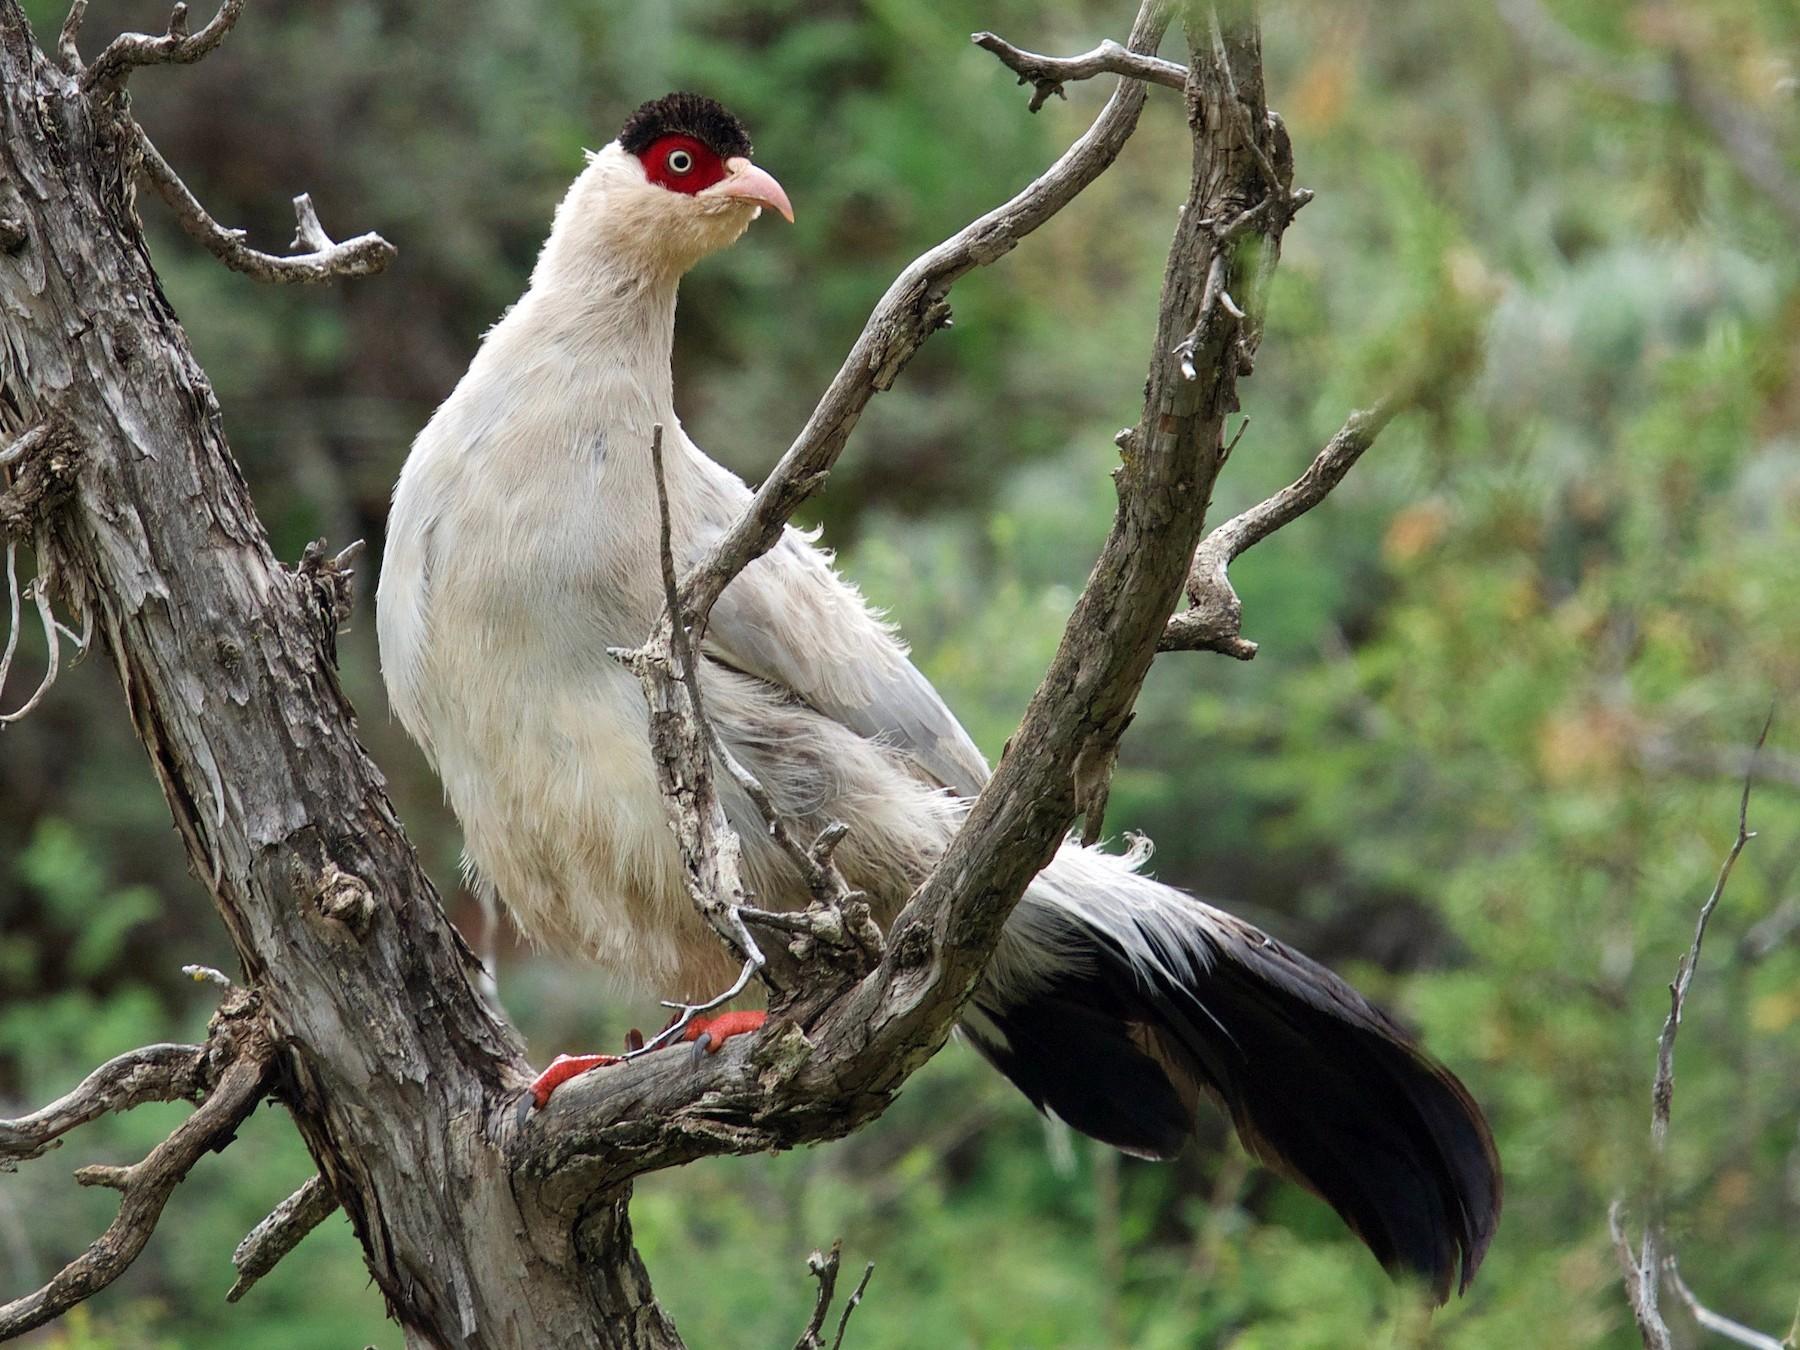 White Eared-Pheasant - Qin Huang